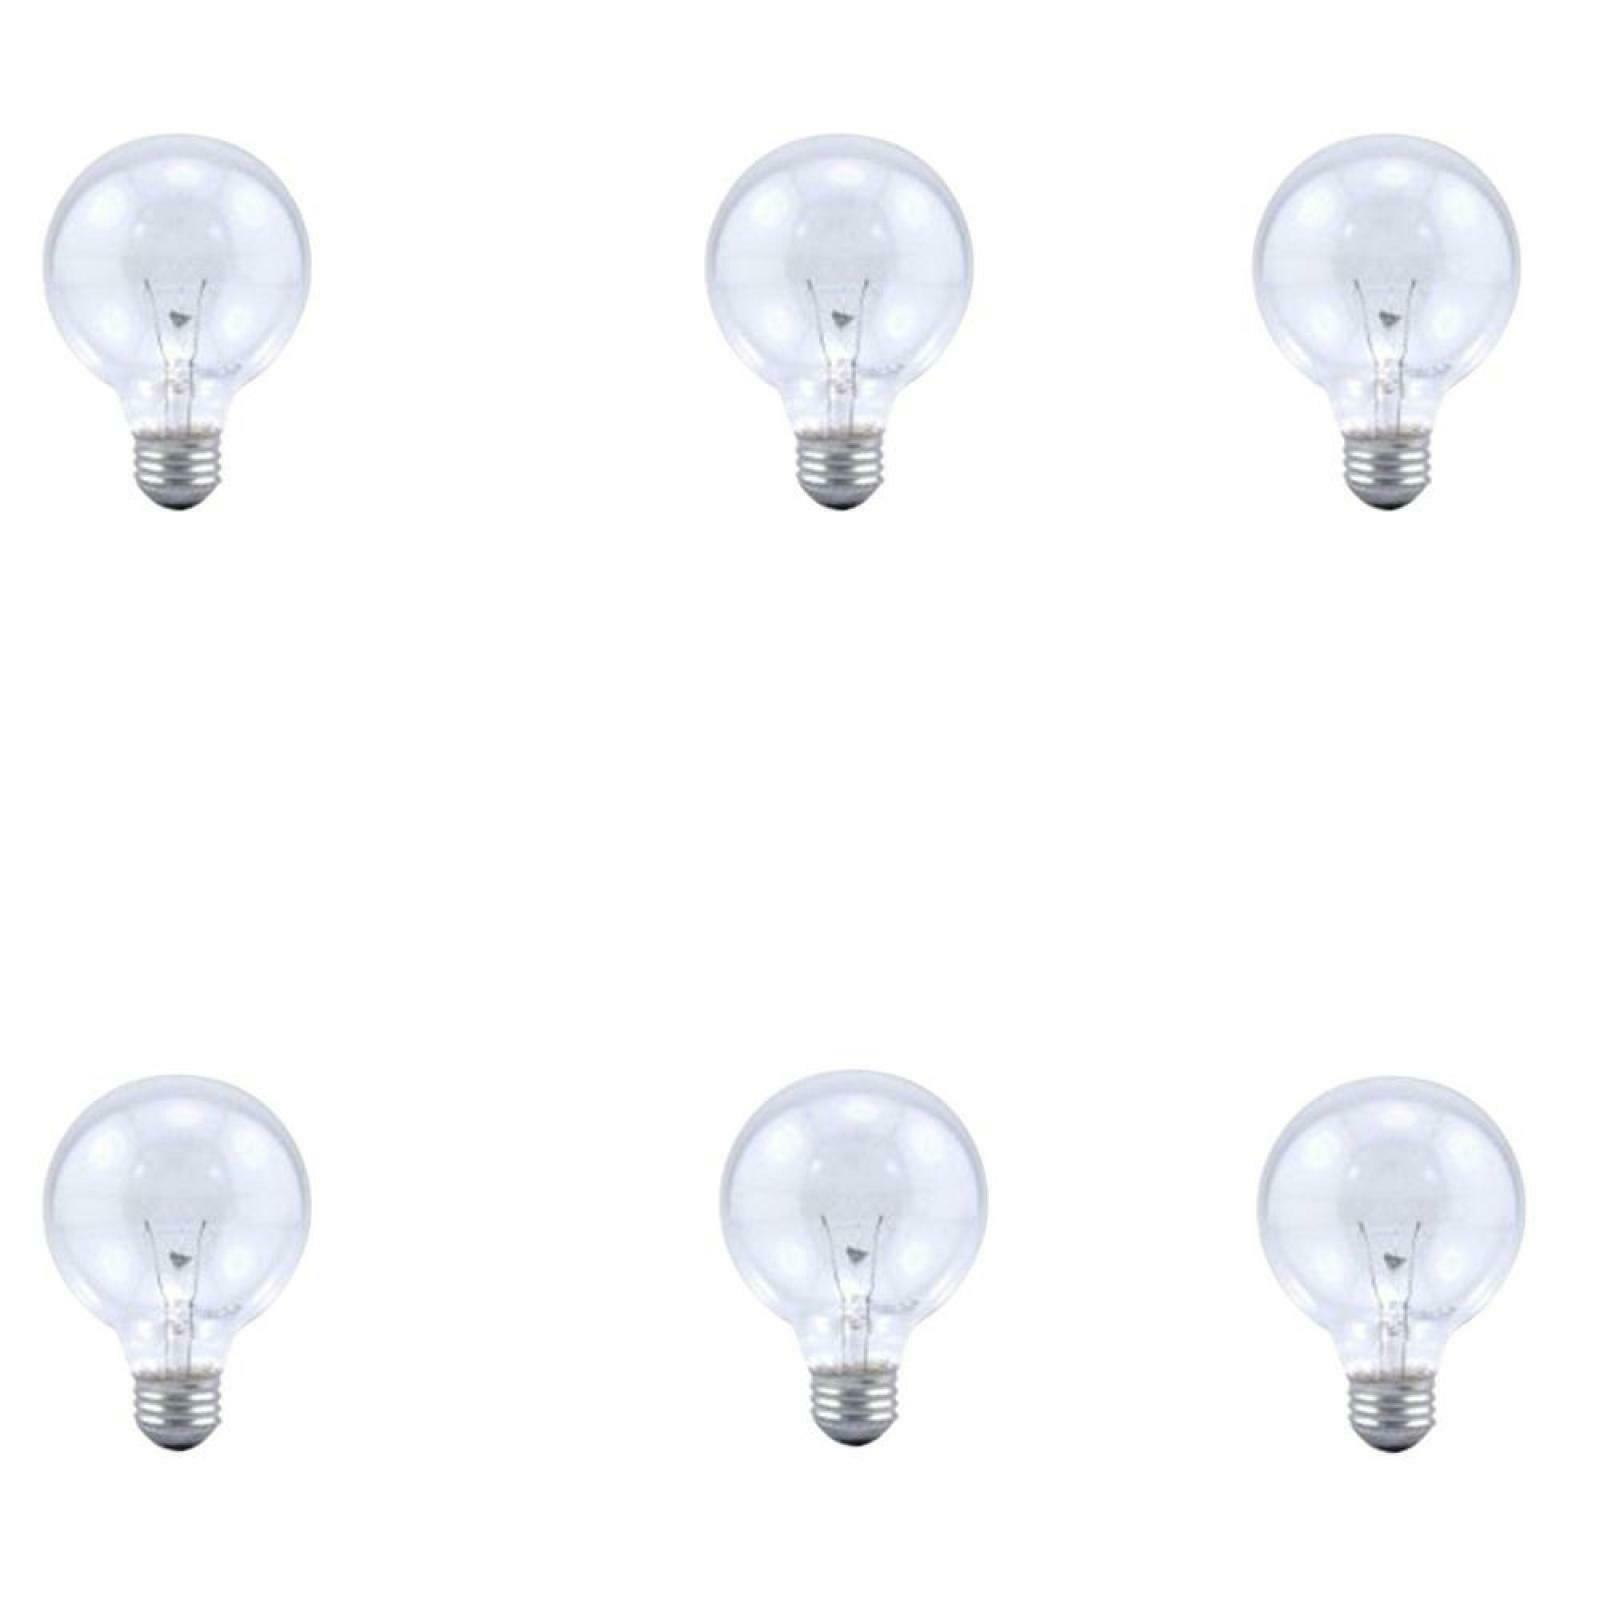 6pk soft clear round globe light bulbs